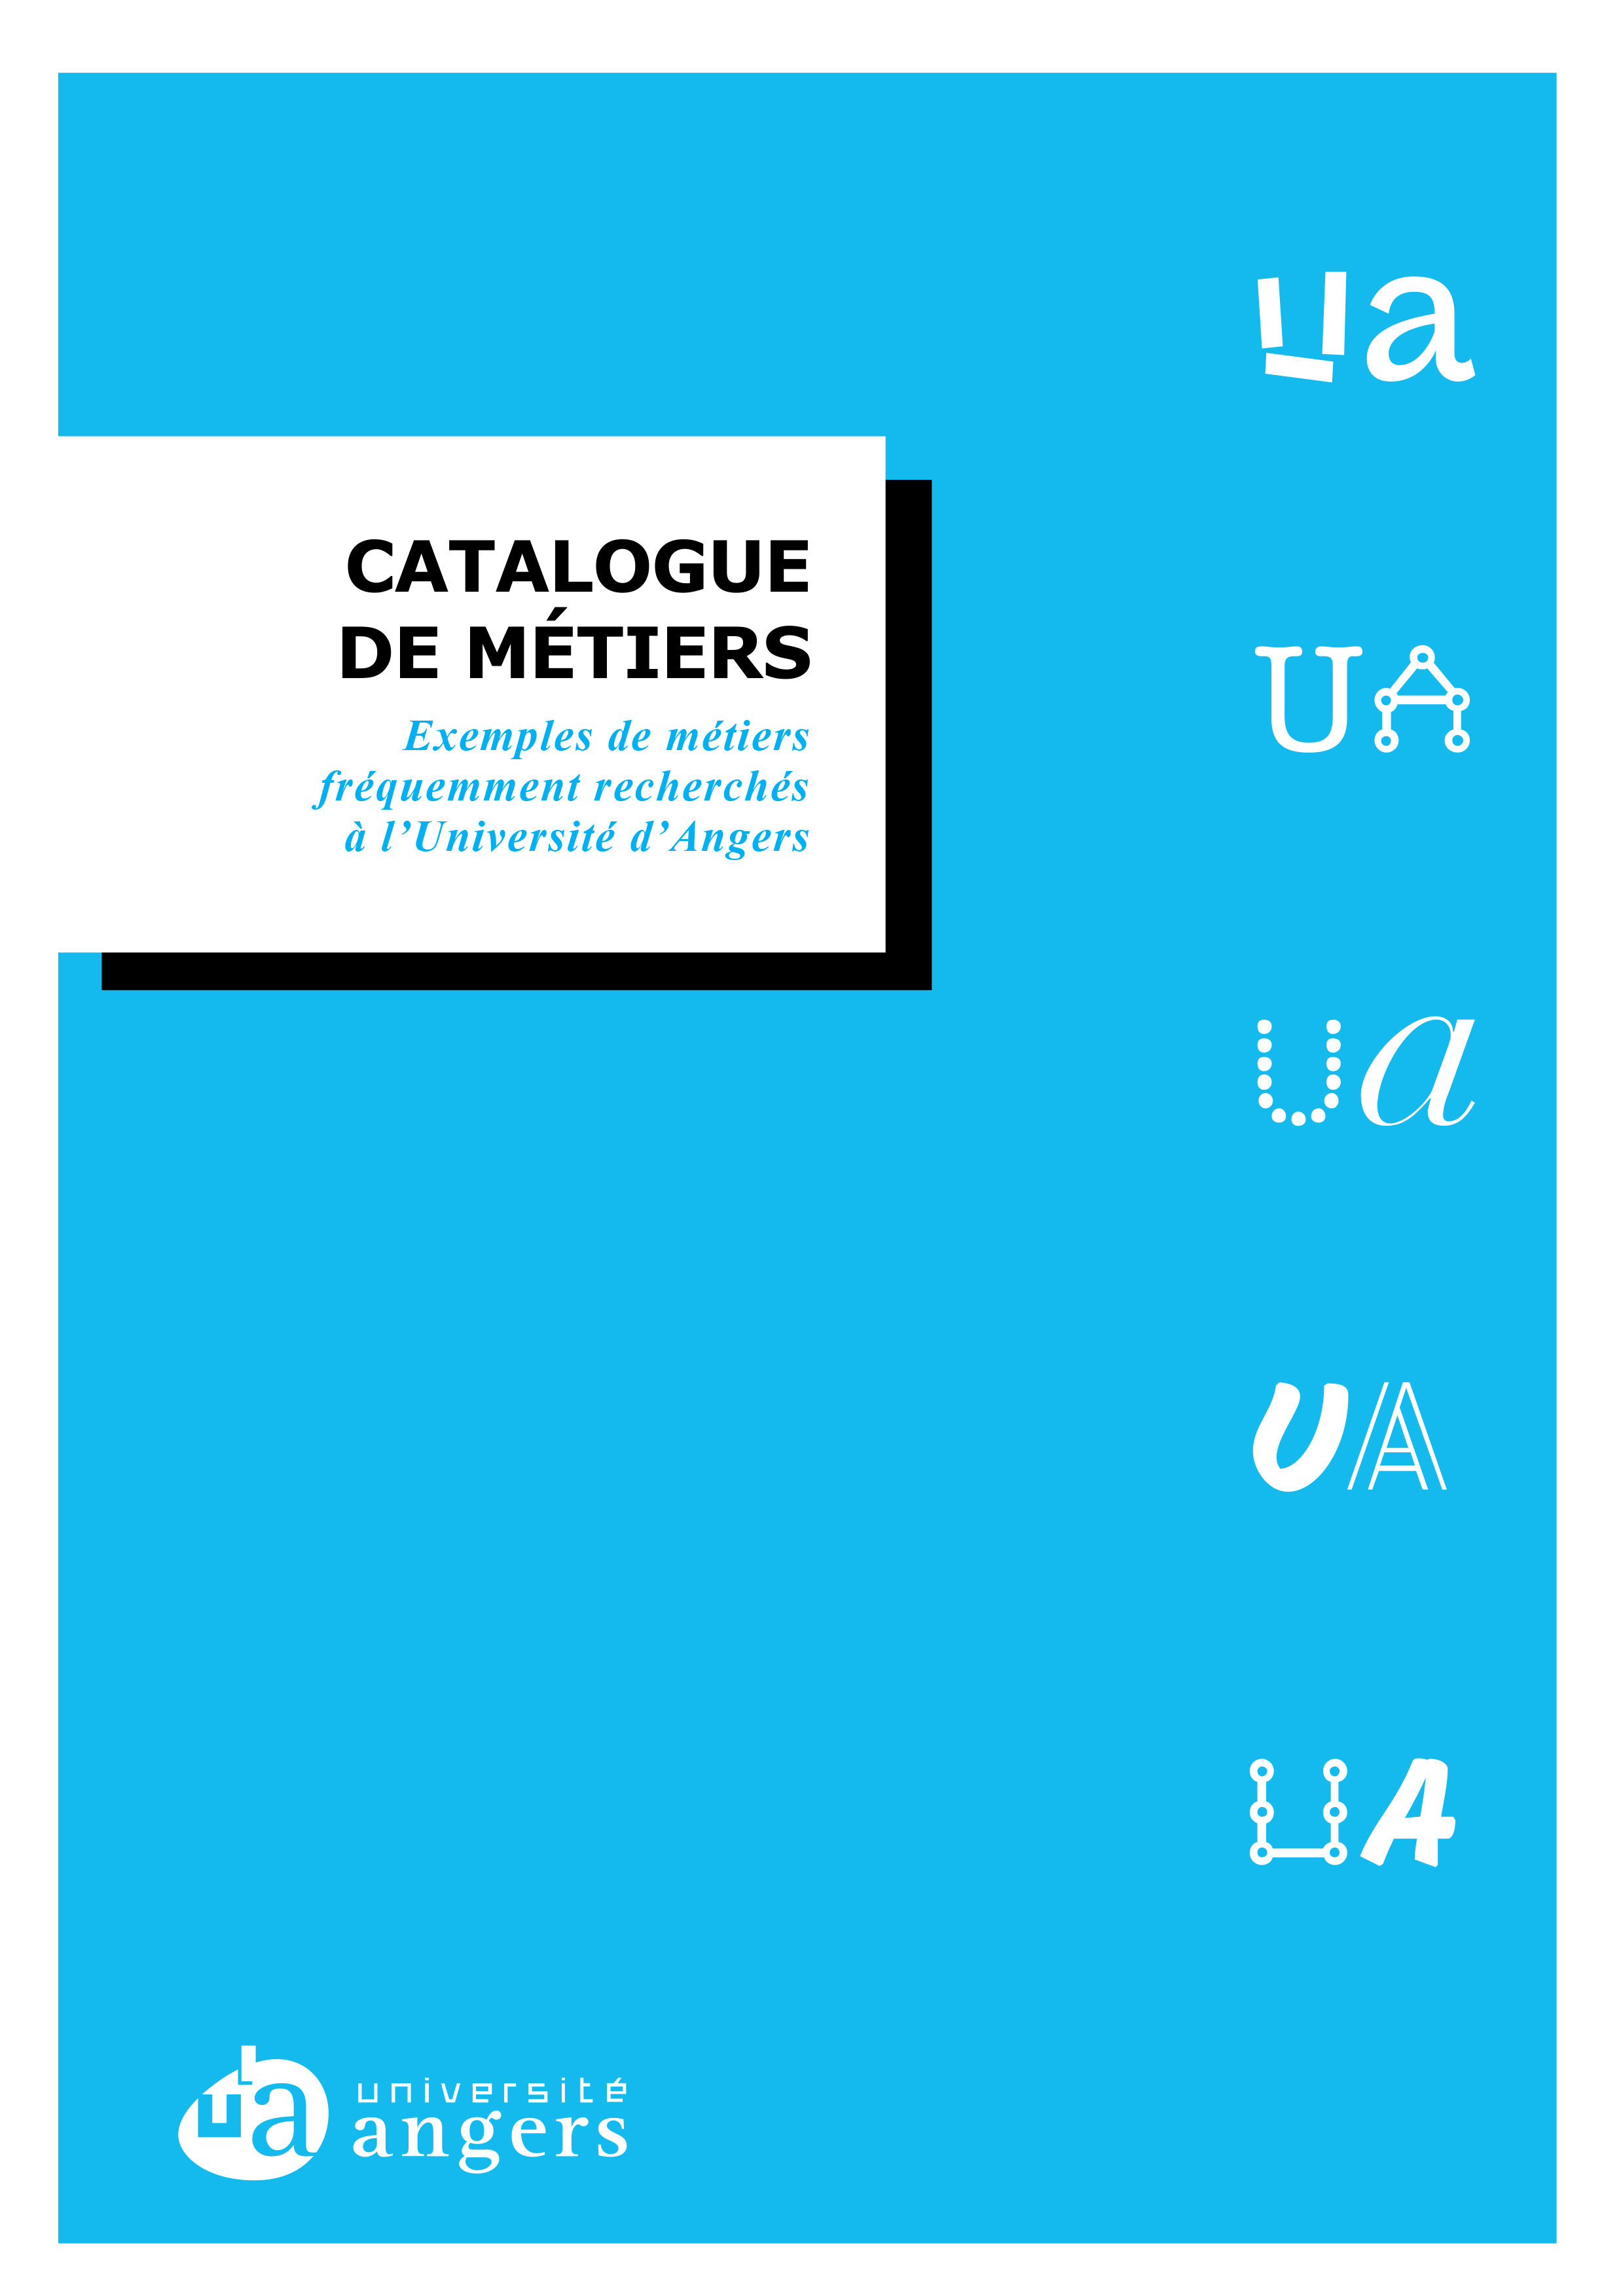 catalogue metiers UA